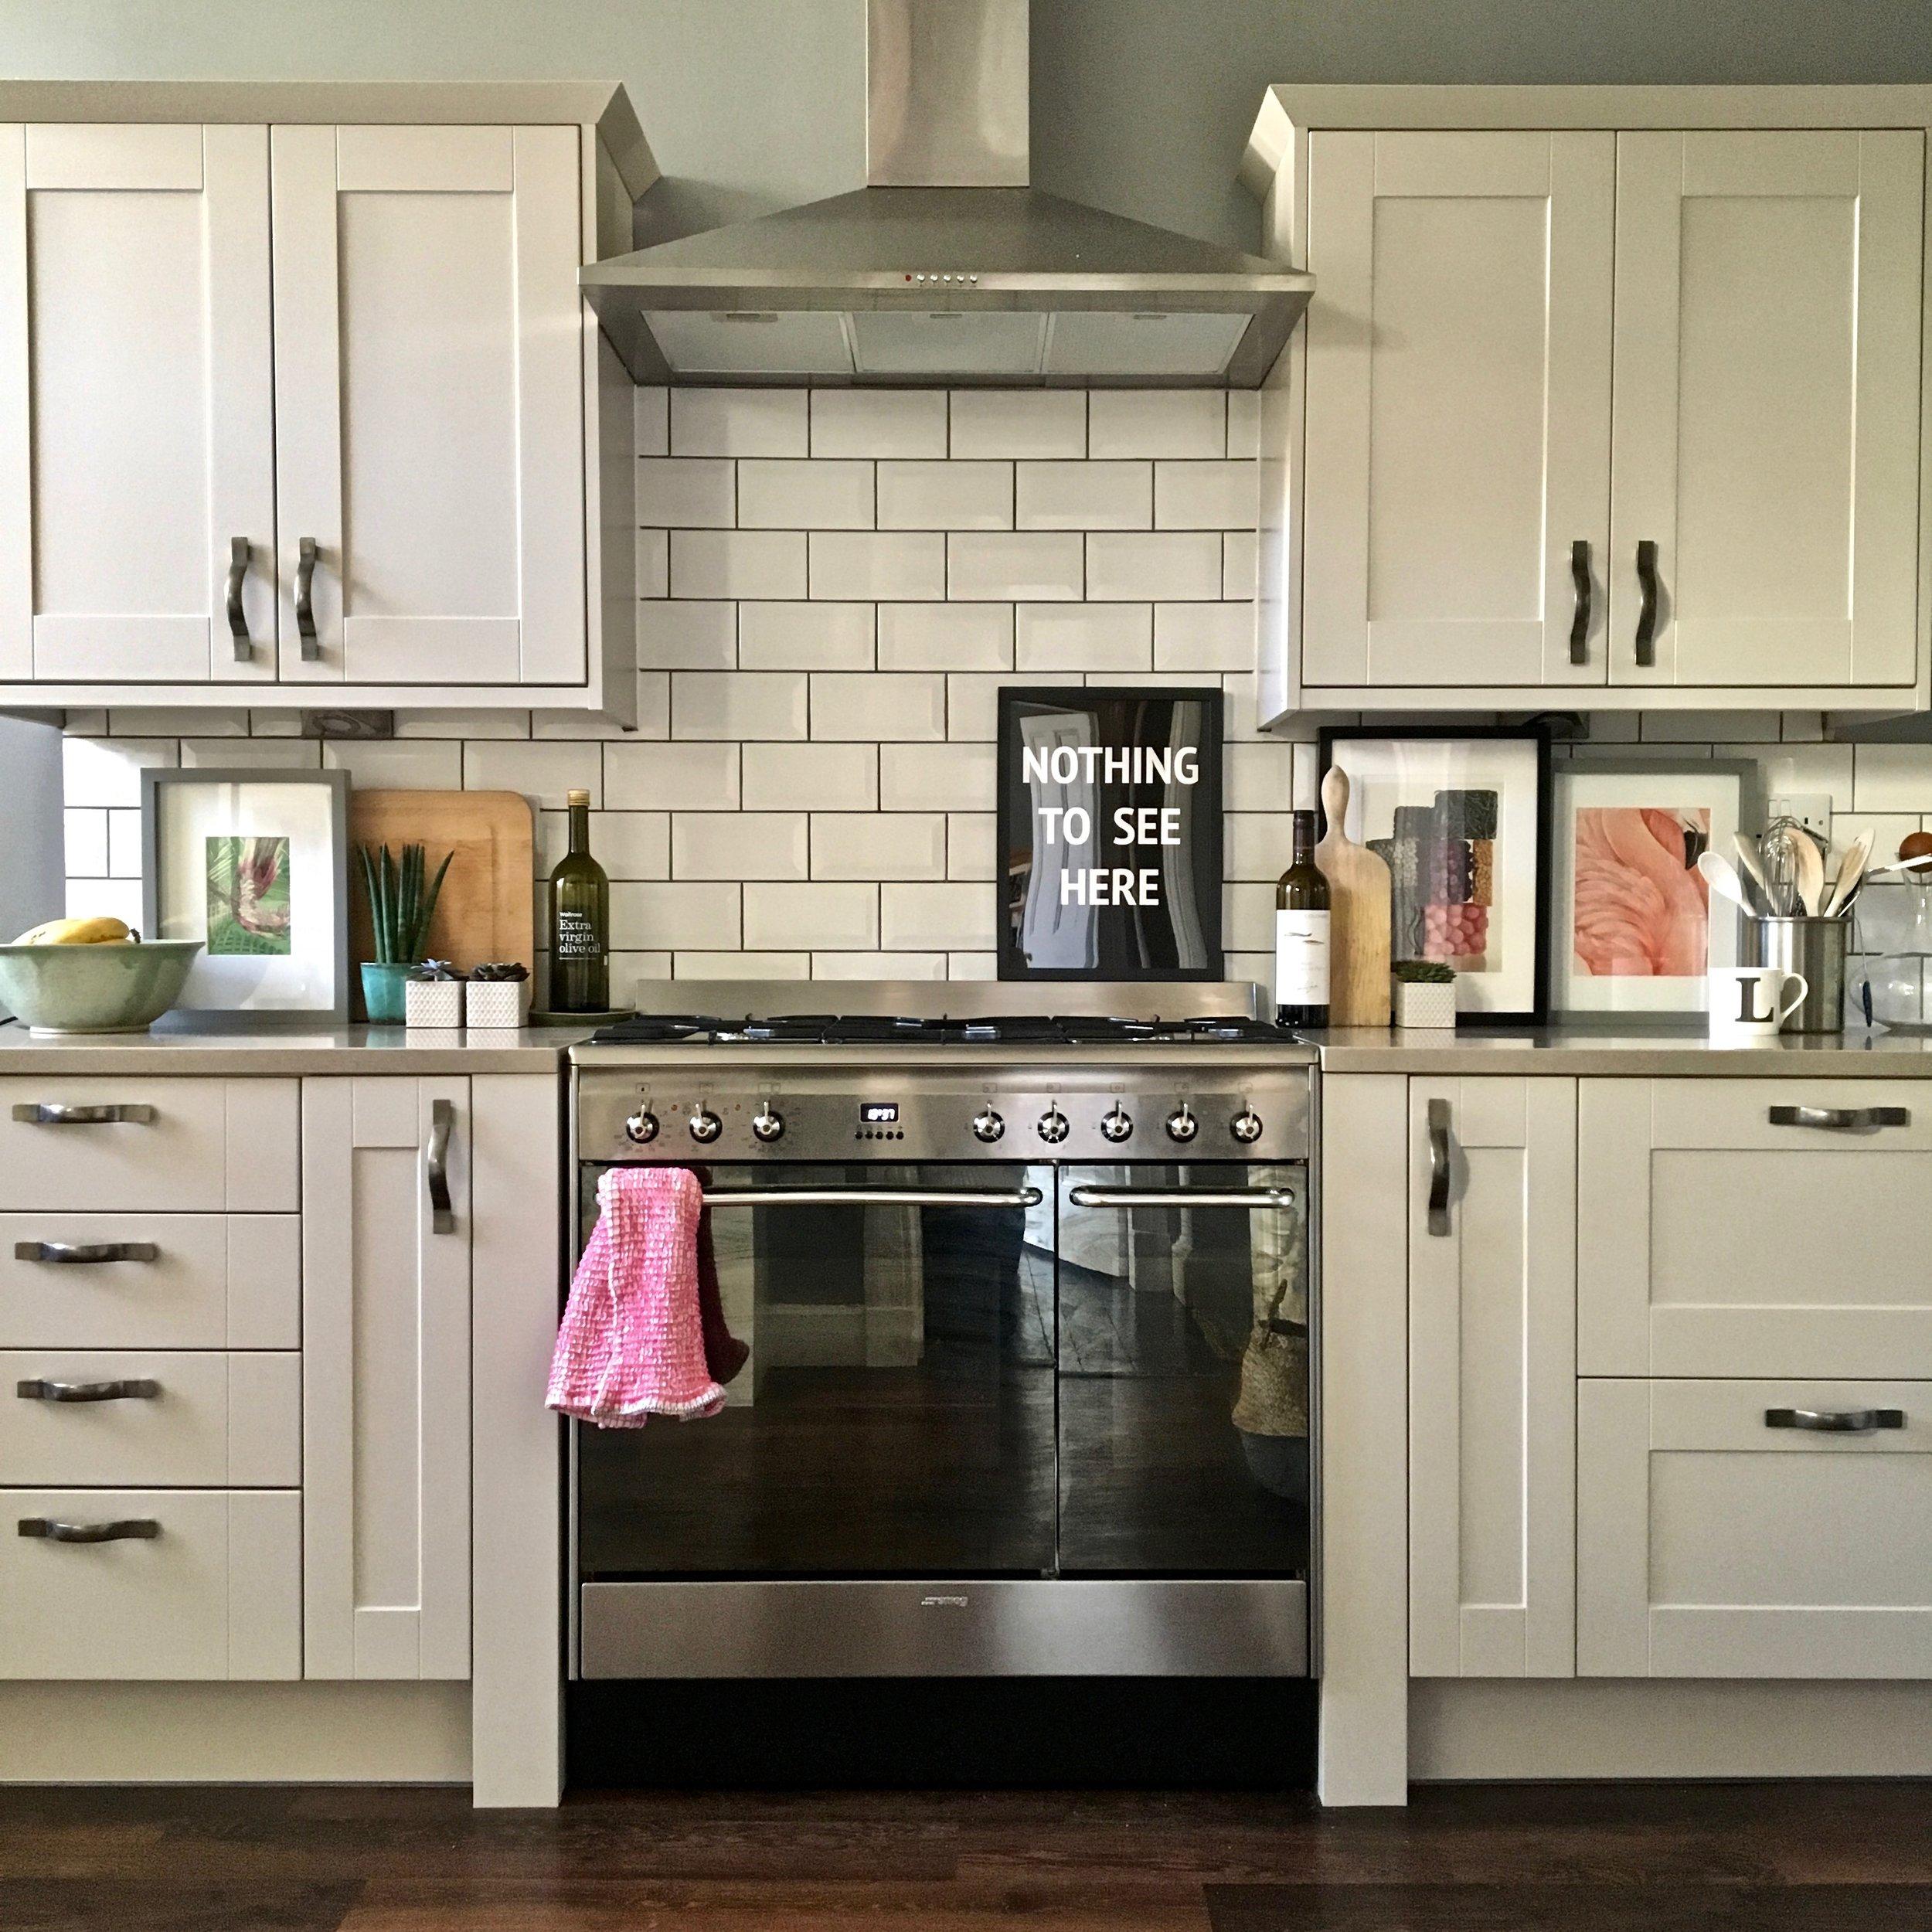 Liznylon_kitchen_with_range_cooker.jpg